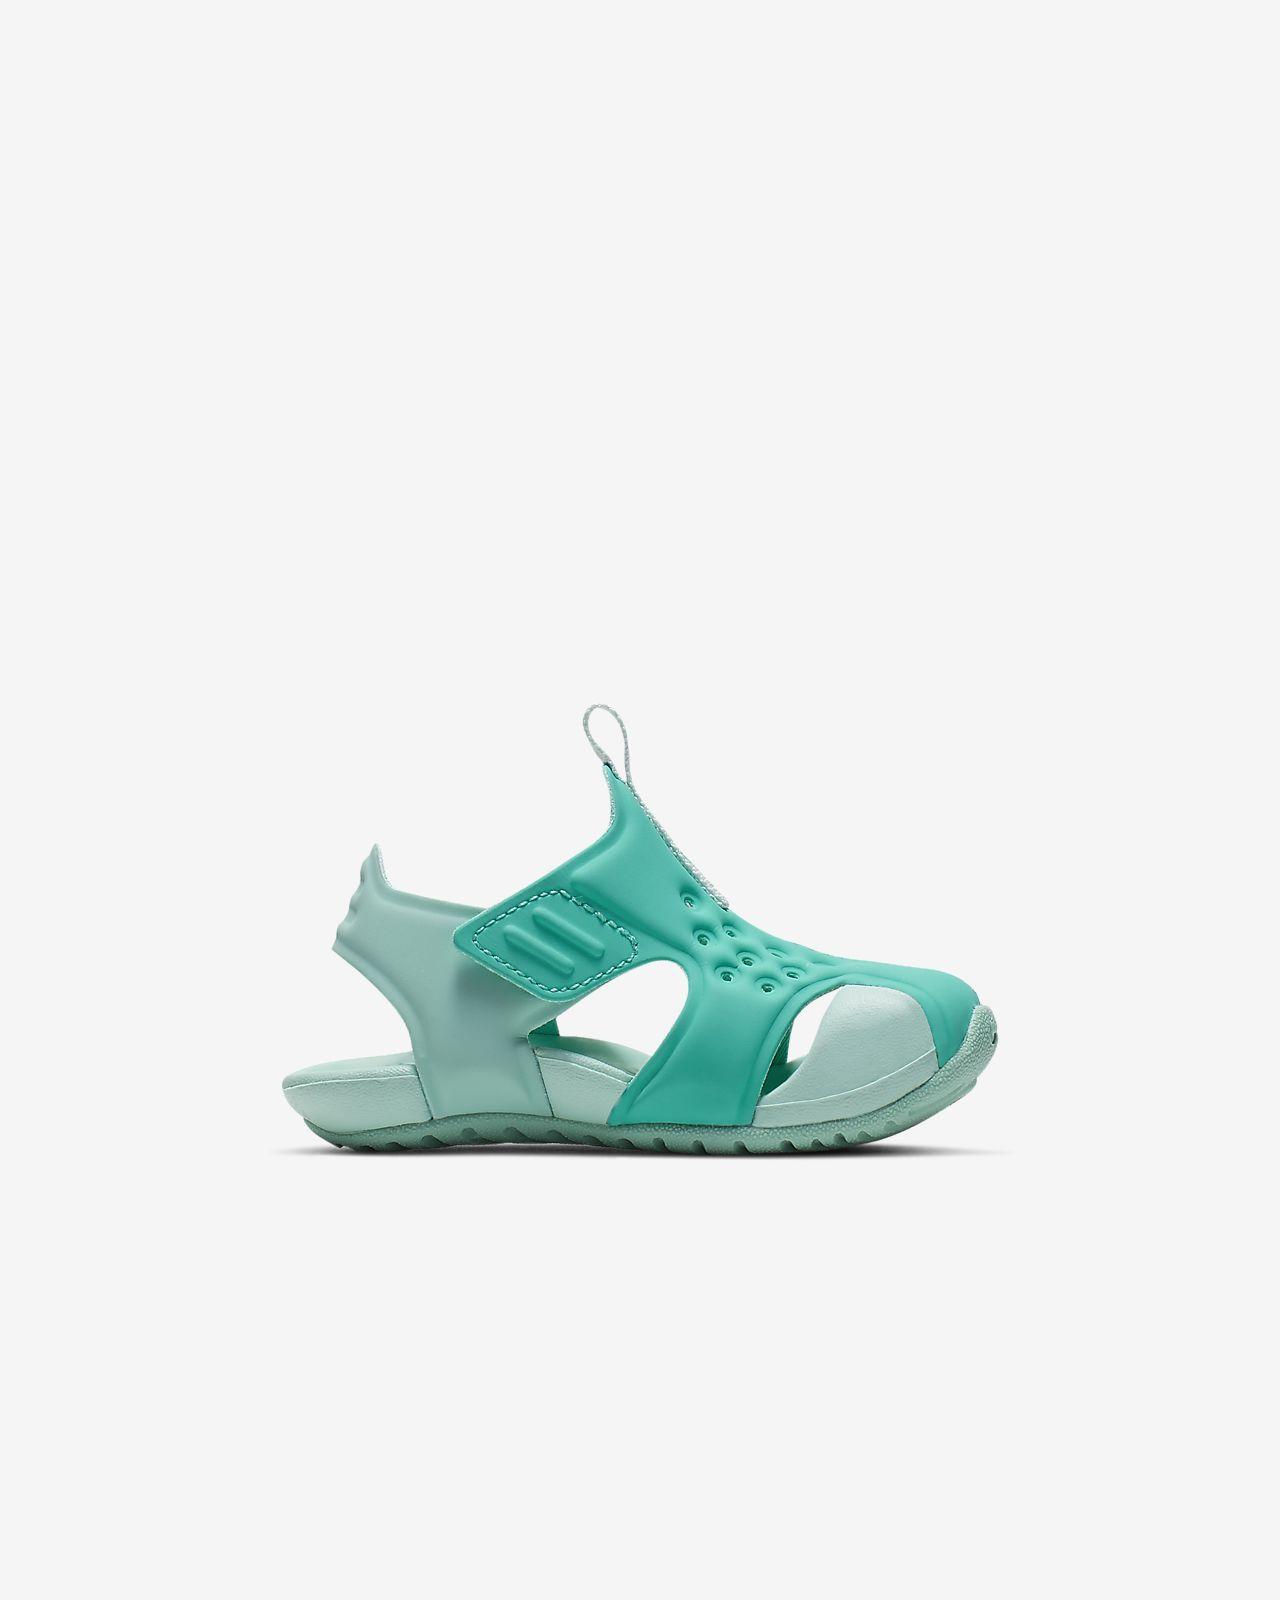 2f01767b4 Nike Sunray Protect 2 Baby   Toddler Sandal. Nike.com AU